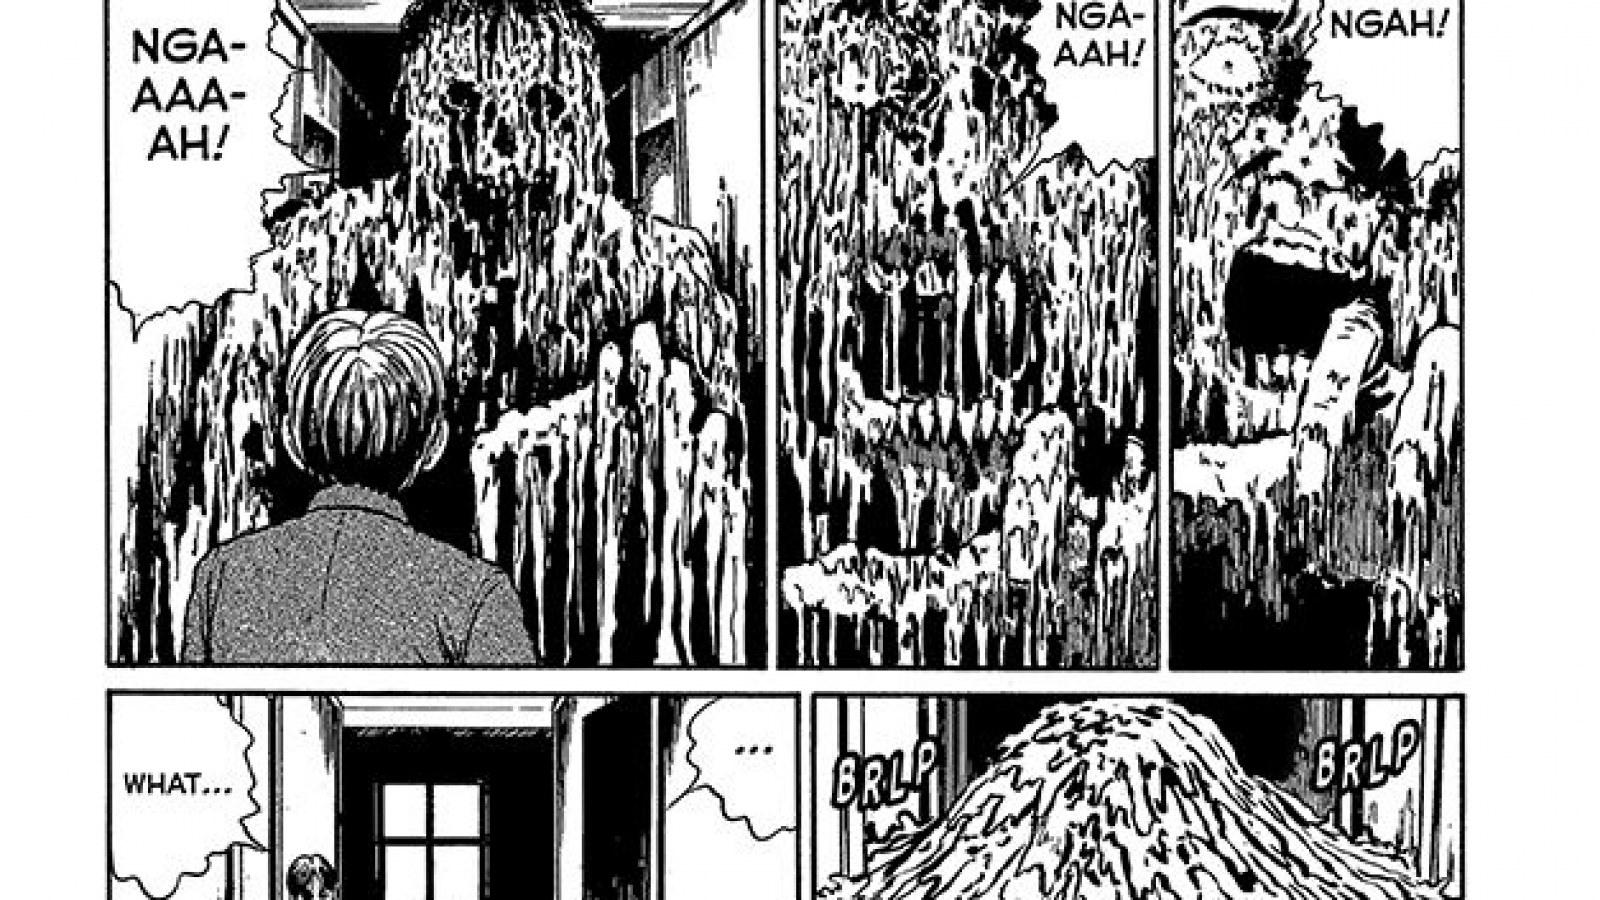 Horror Manga Artist Junji Ito Interview Creepy Stuff Inside His Head